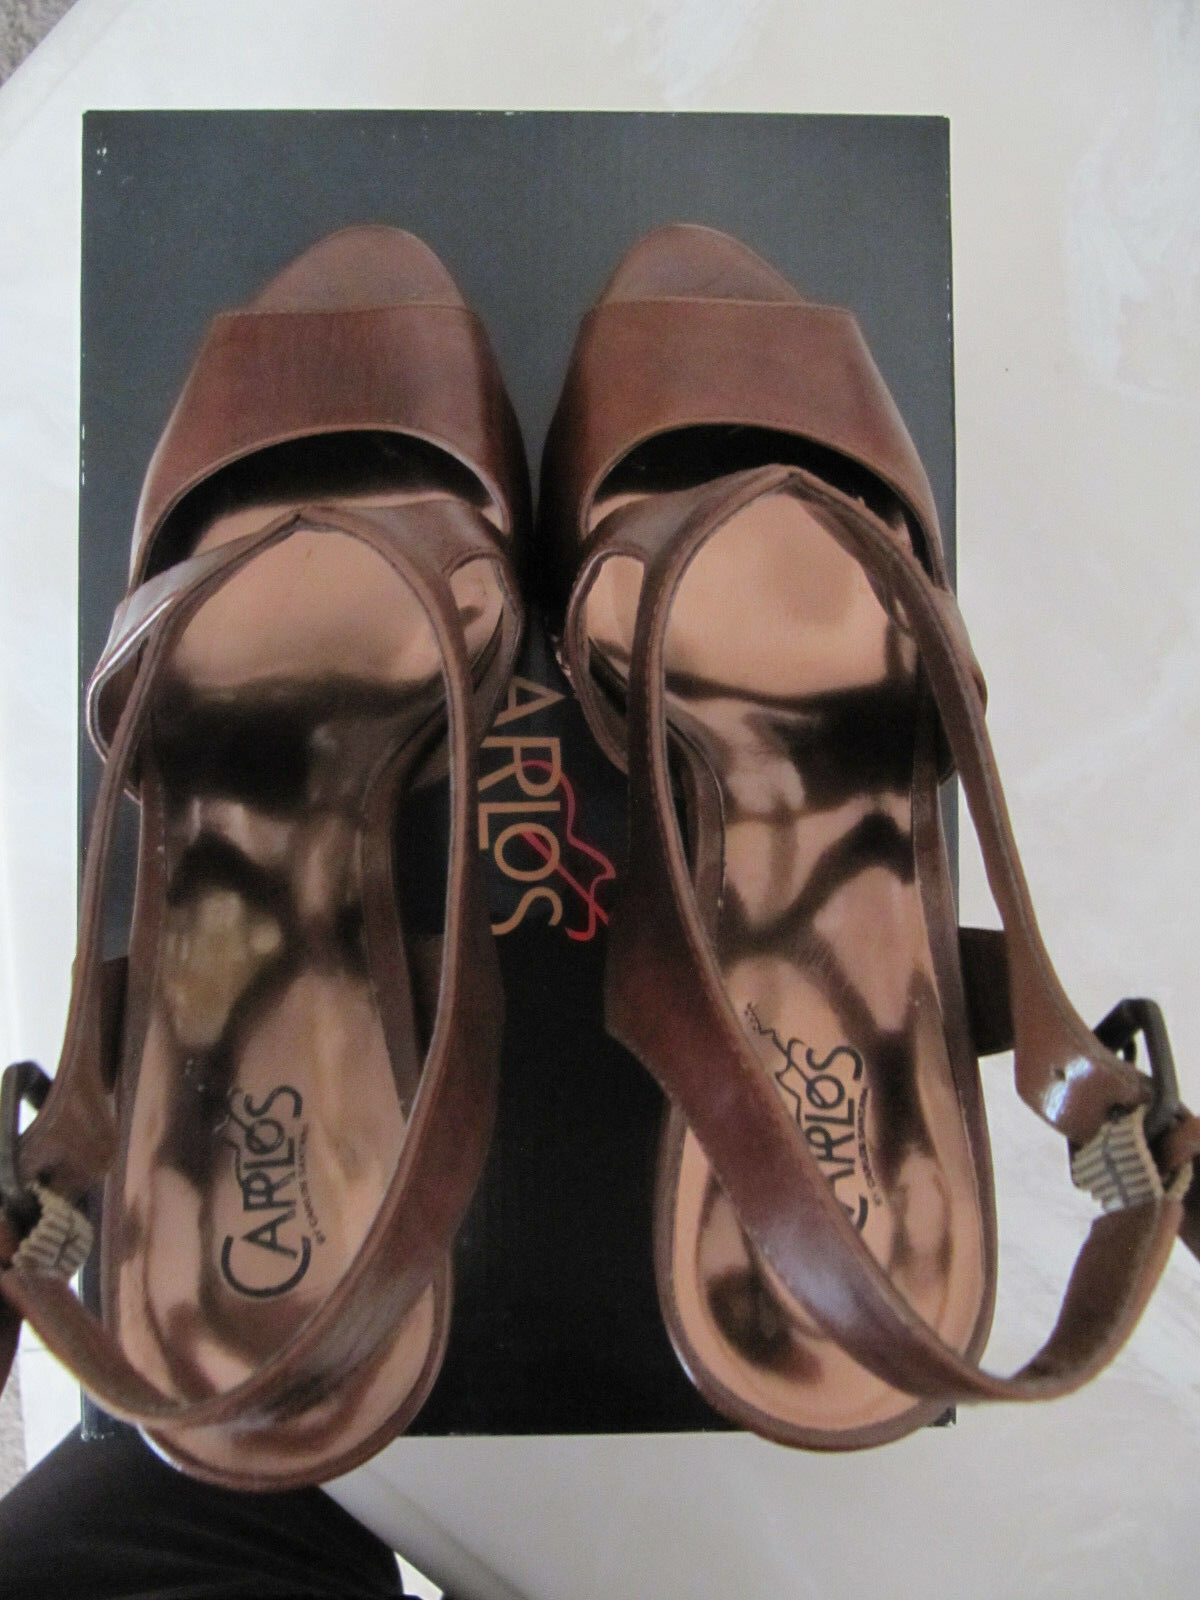 CARLOS BY CARLOS SANTANA SANTANA SANTANA Platform Sandal Davivci 3, Bark Leath Dimensione 8 Med  129 6ee8ca